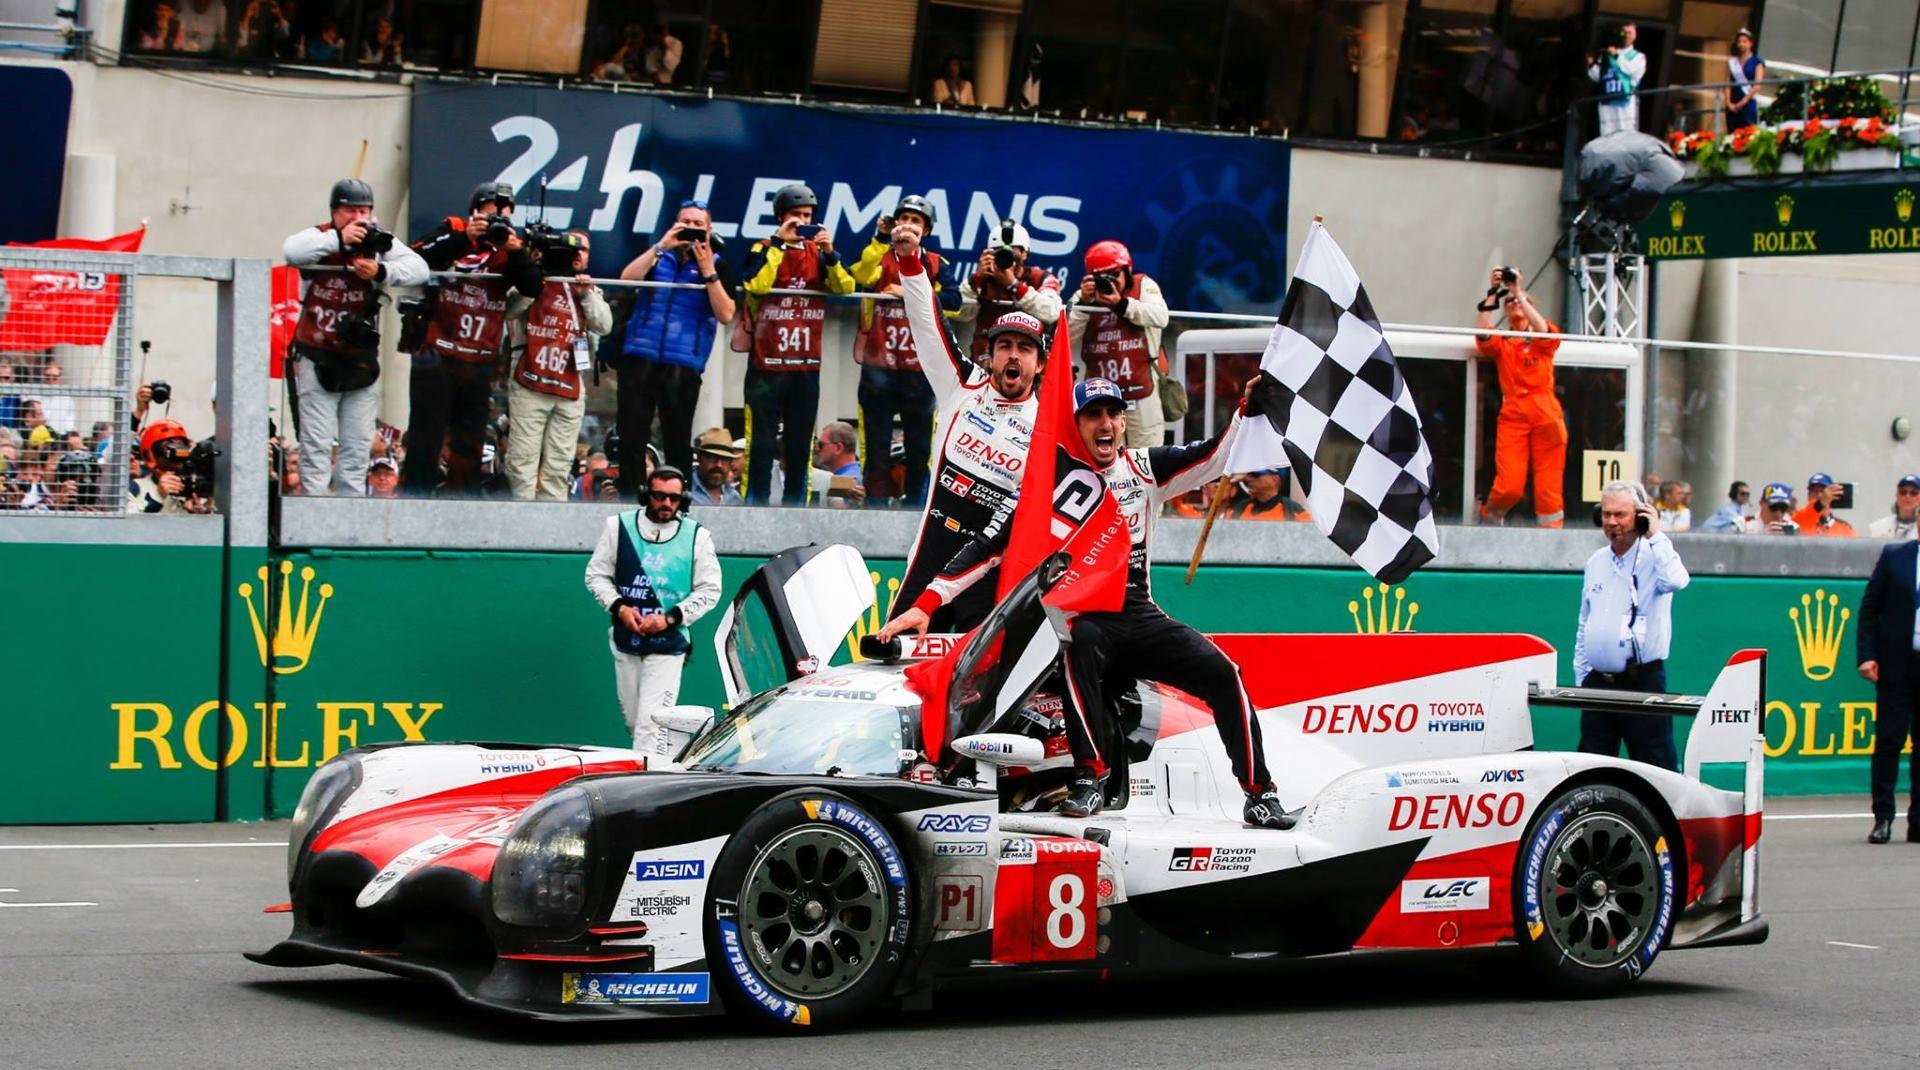 VIDEO: Fernando Alonso se uplašio neuspjeha na utrci Le Mans 24 Hours